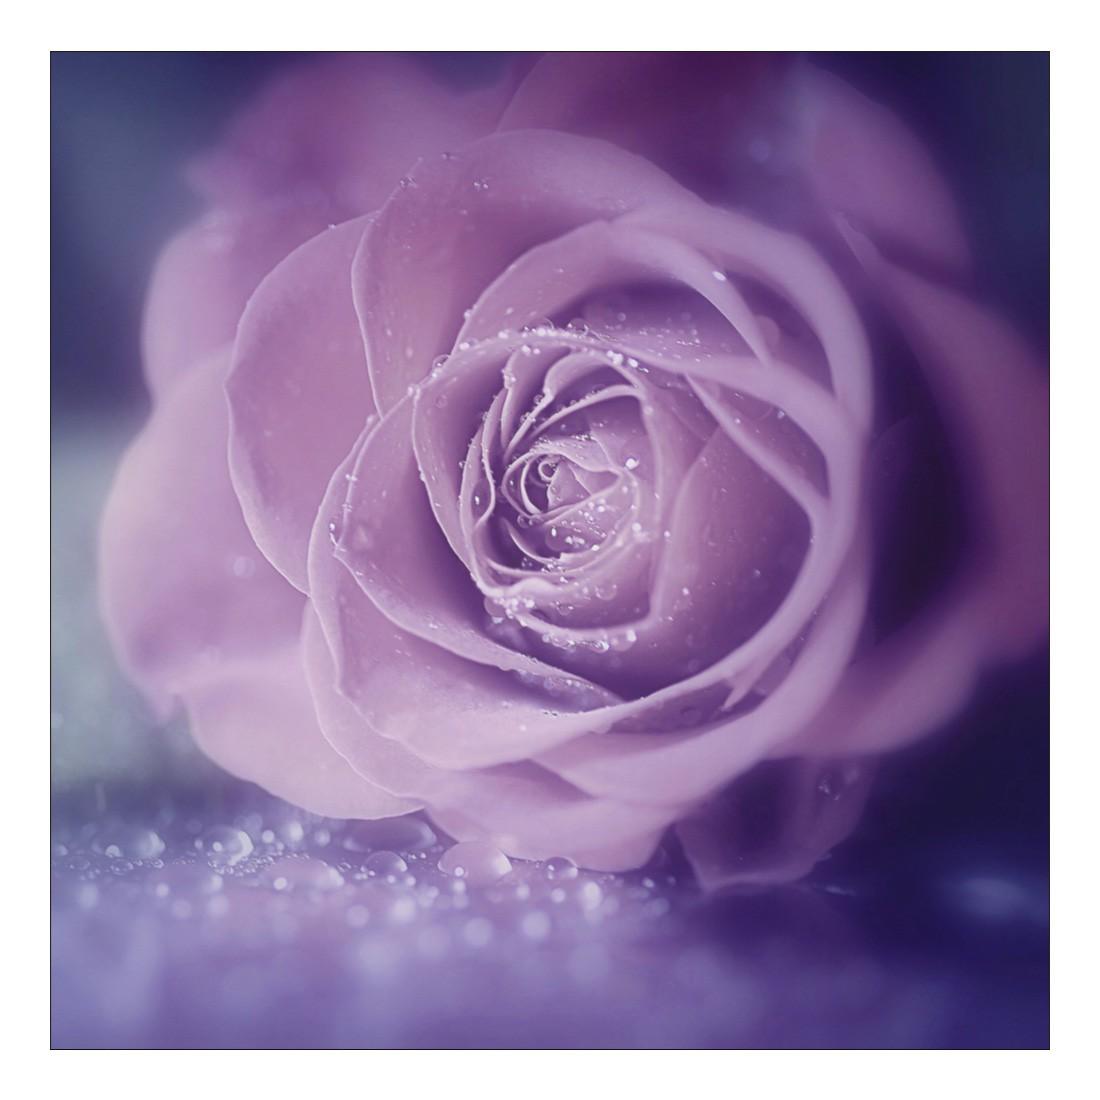 Leinwandbild PINK WET MACRO ROSE – Abmessung 100 x 50 cm, Gallery of Innovative Art günstig online kaufen